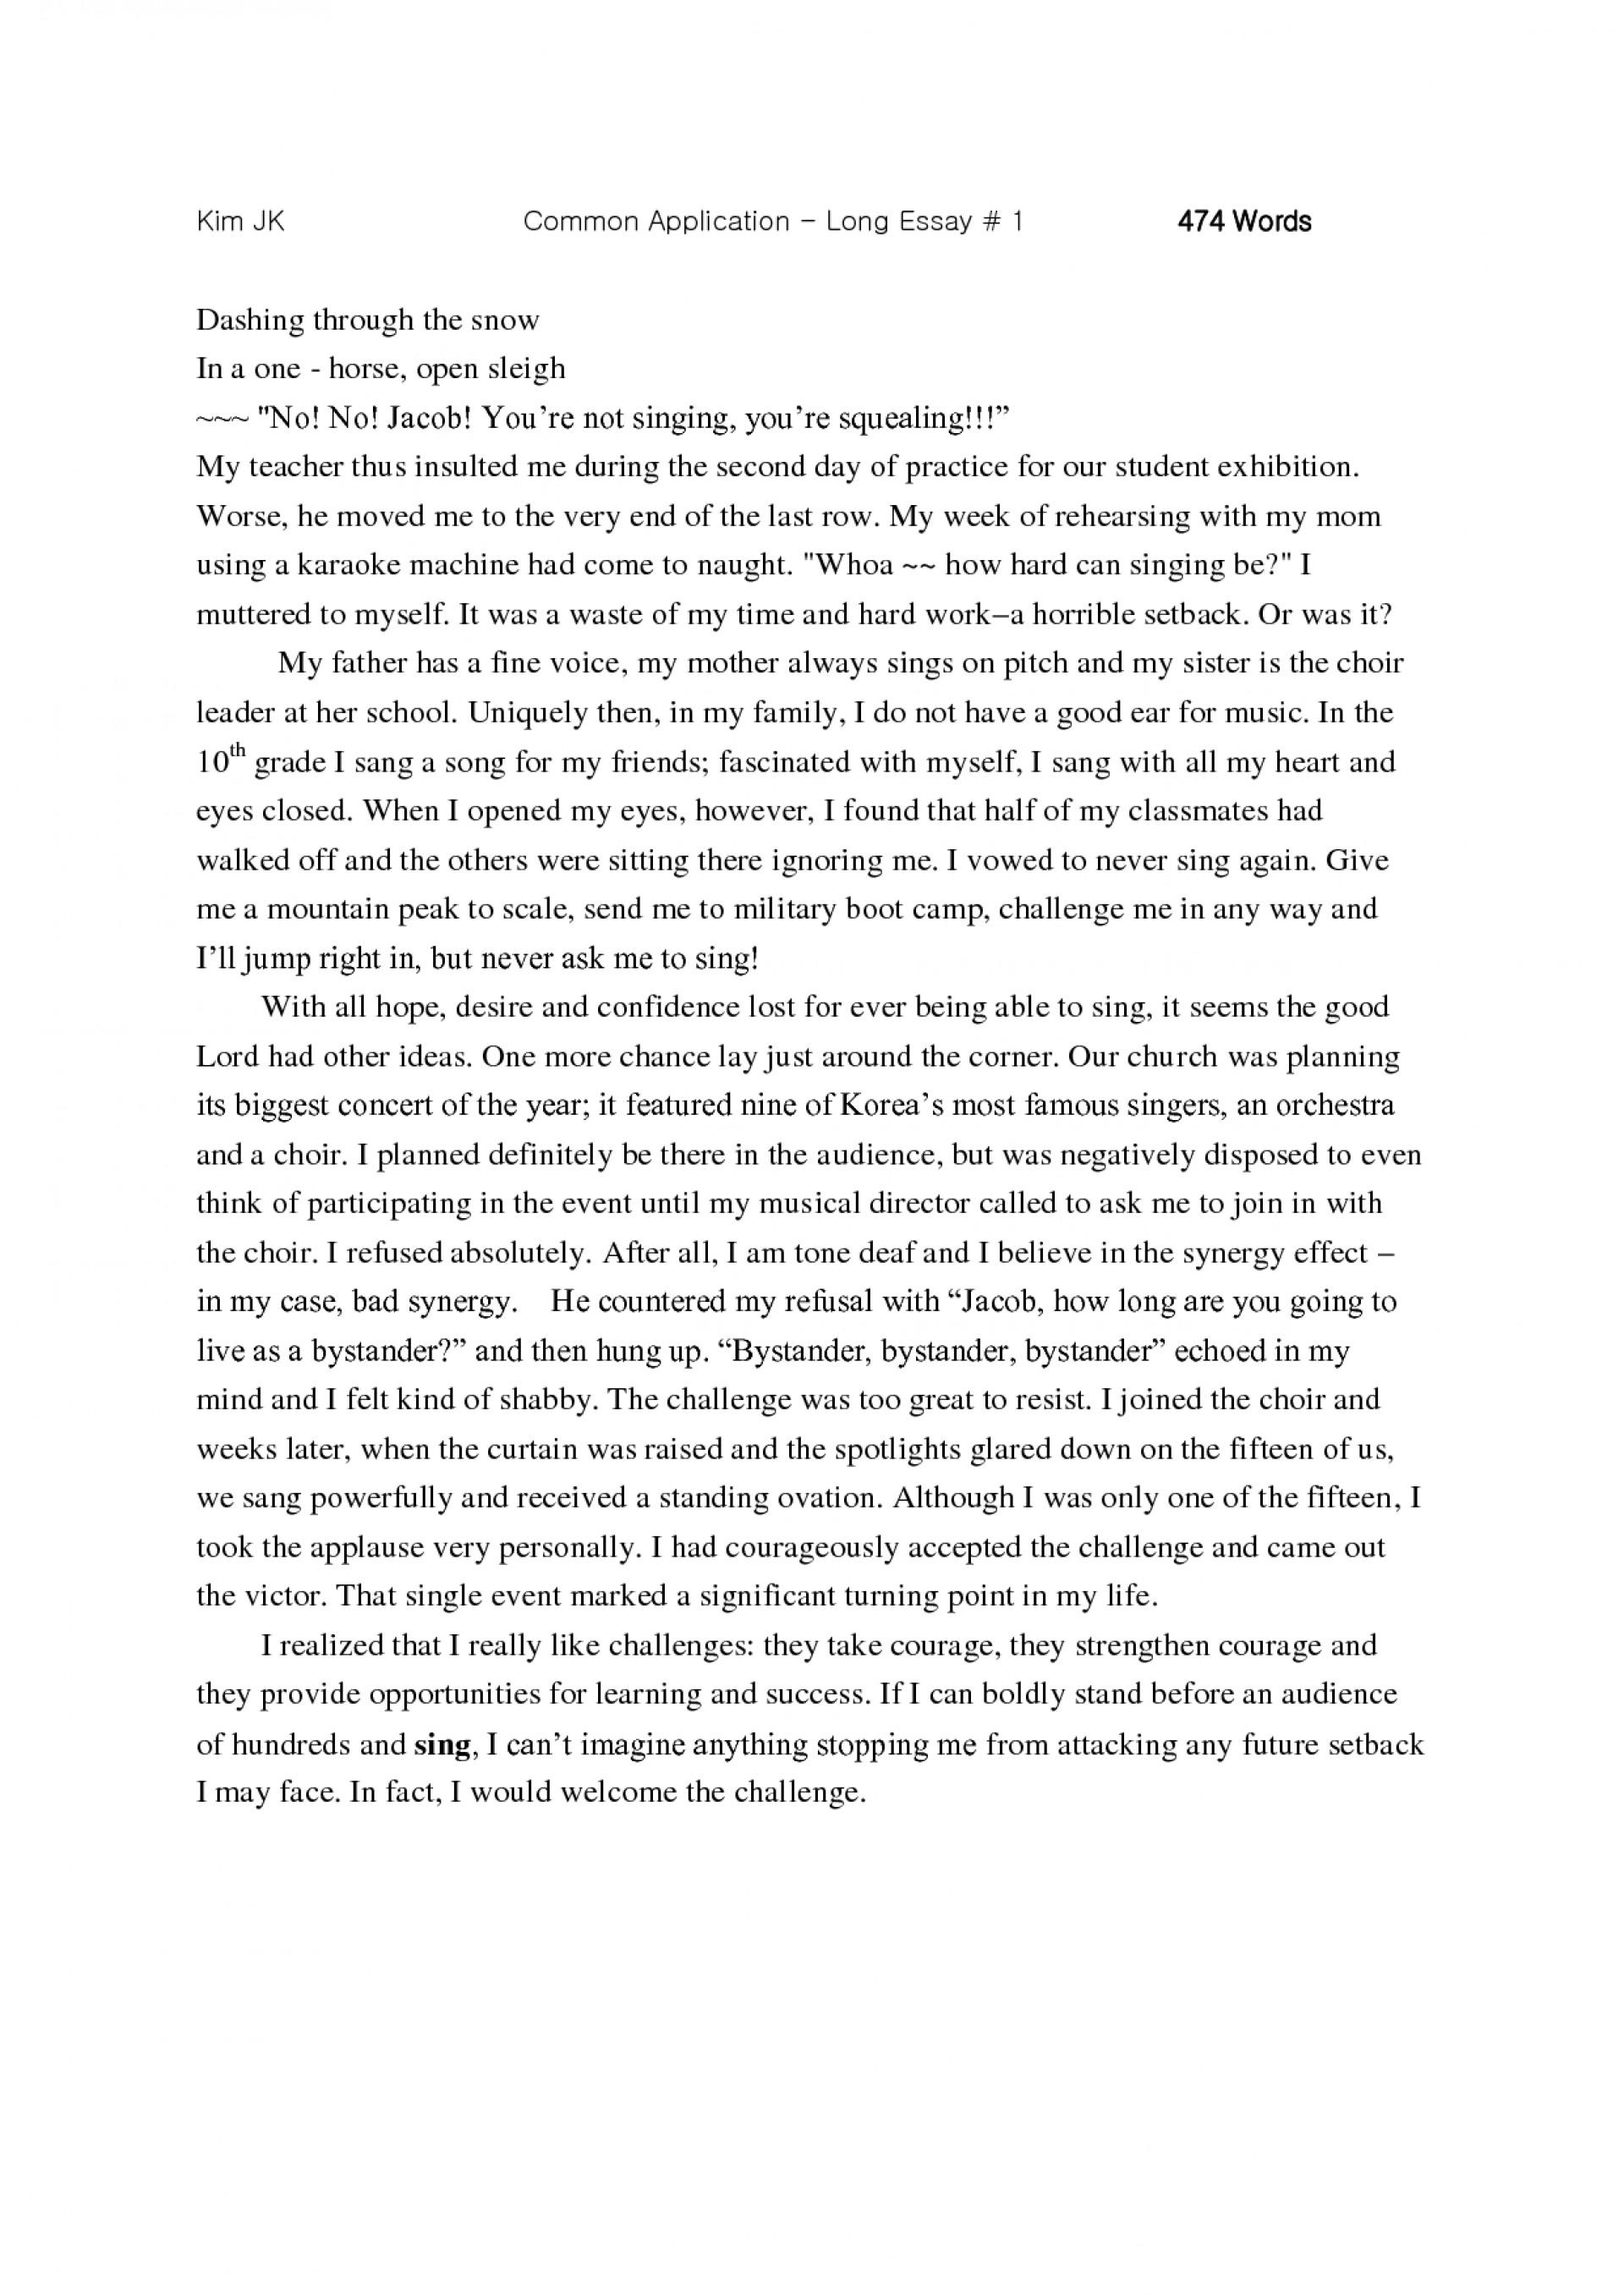 001 Essay Example Brilliant Ideas Of Collegepplication Examples Format Targer Golden Dragon Fantastic Good Commonpp Essays Successful Dreaded Common App Dartmouth Reddit Ivy League 1920